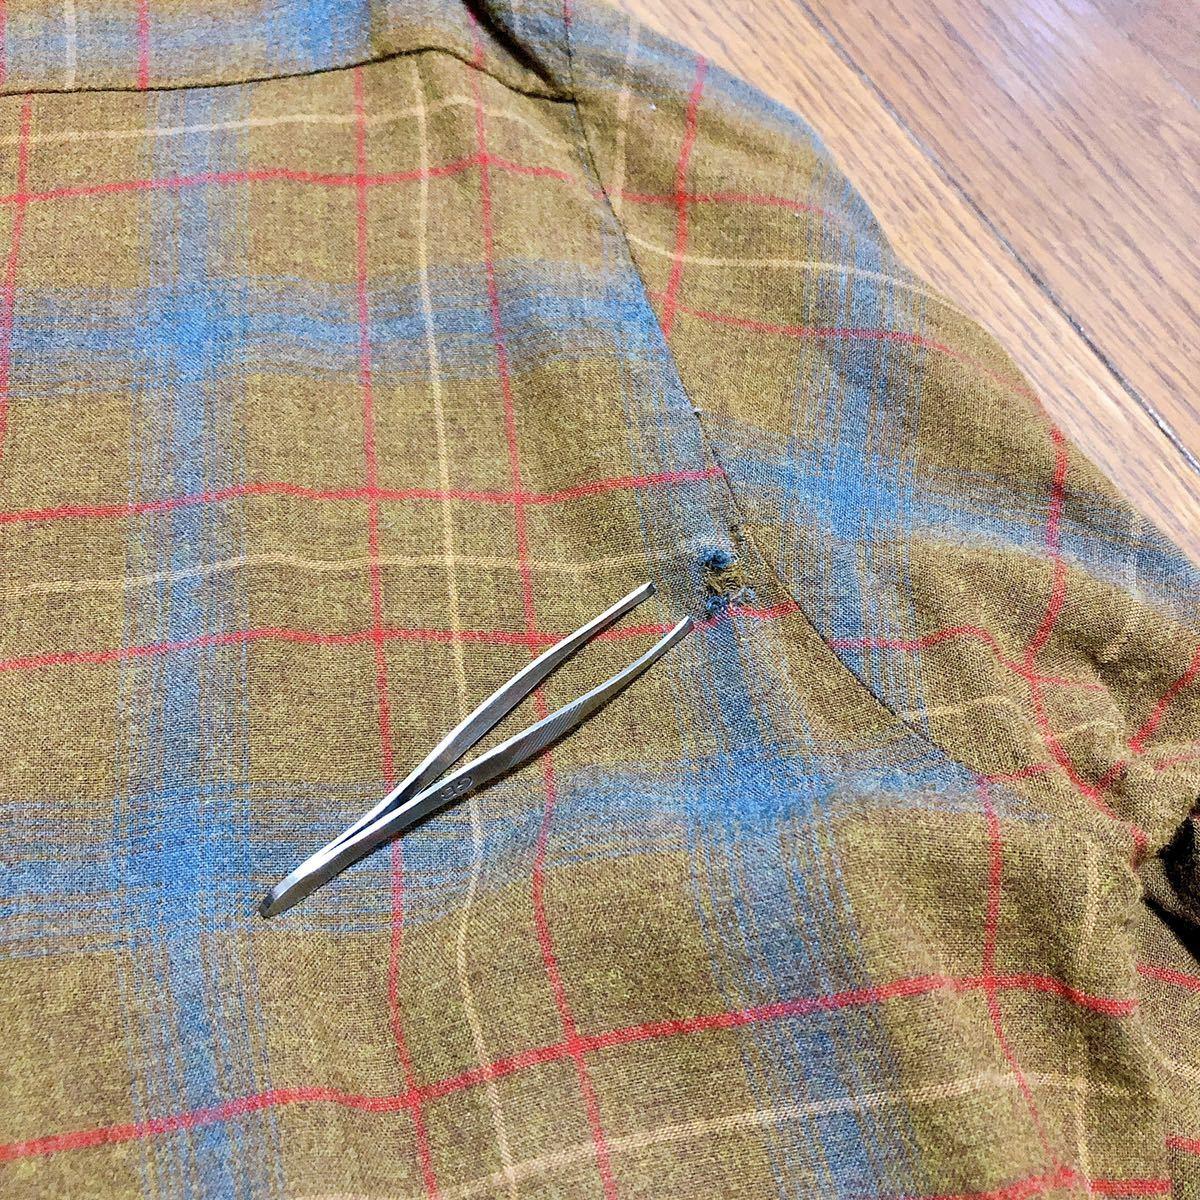 Vintage レーヨン チェックシャツ XL 長袖シャツ チェックシャツ ビンテージ タウンクラフト_画像6